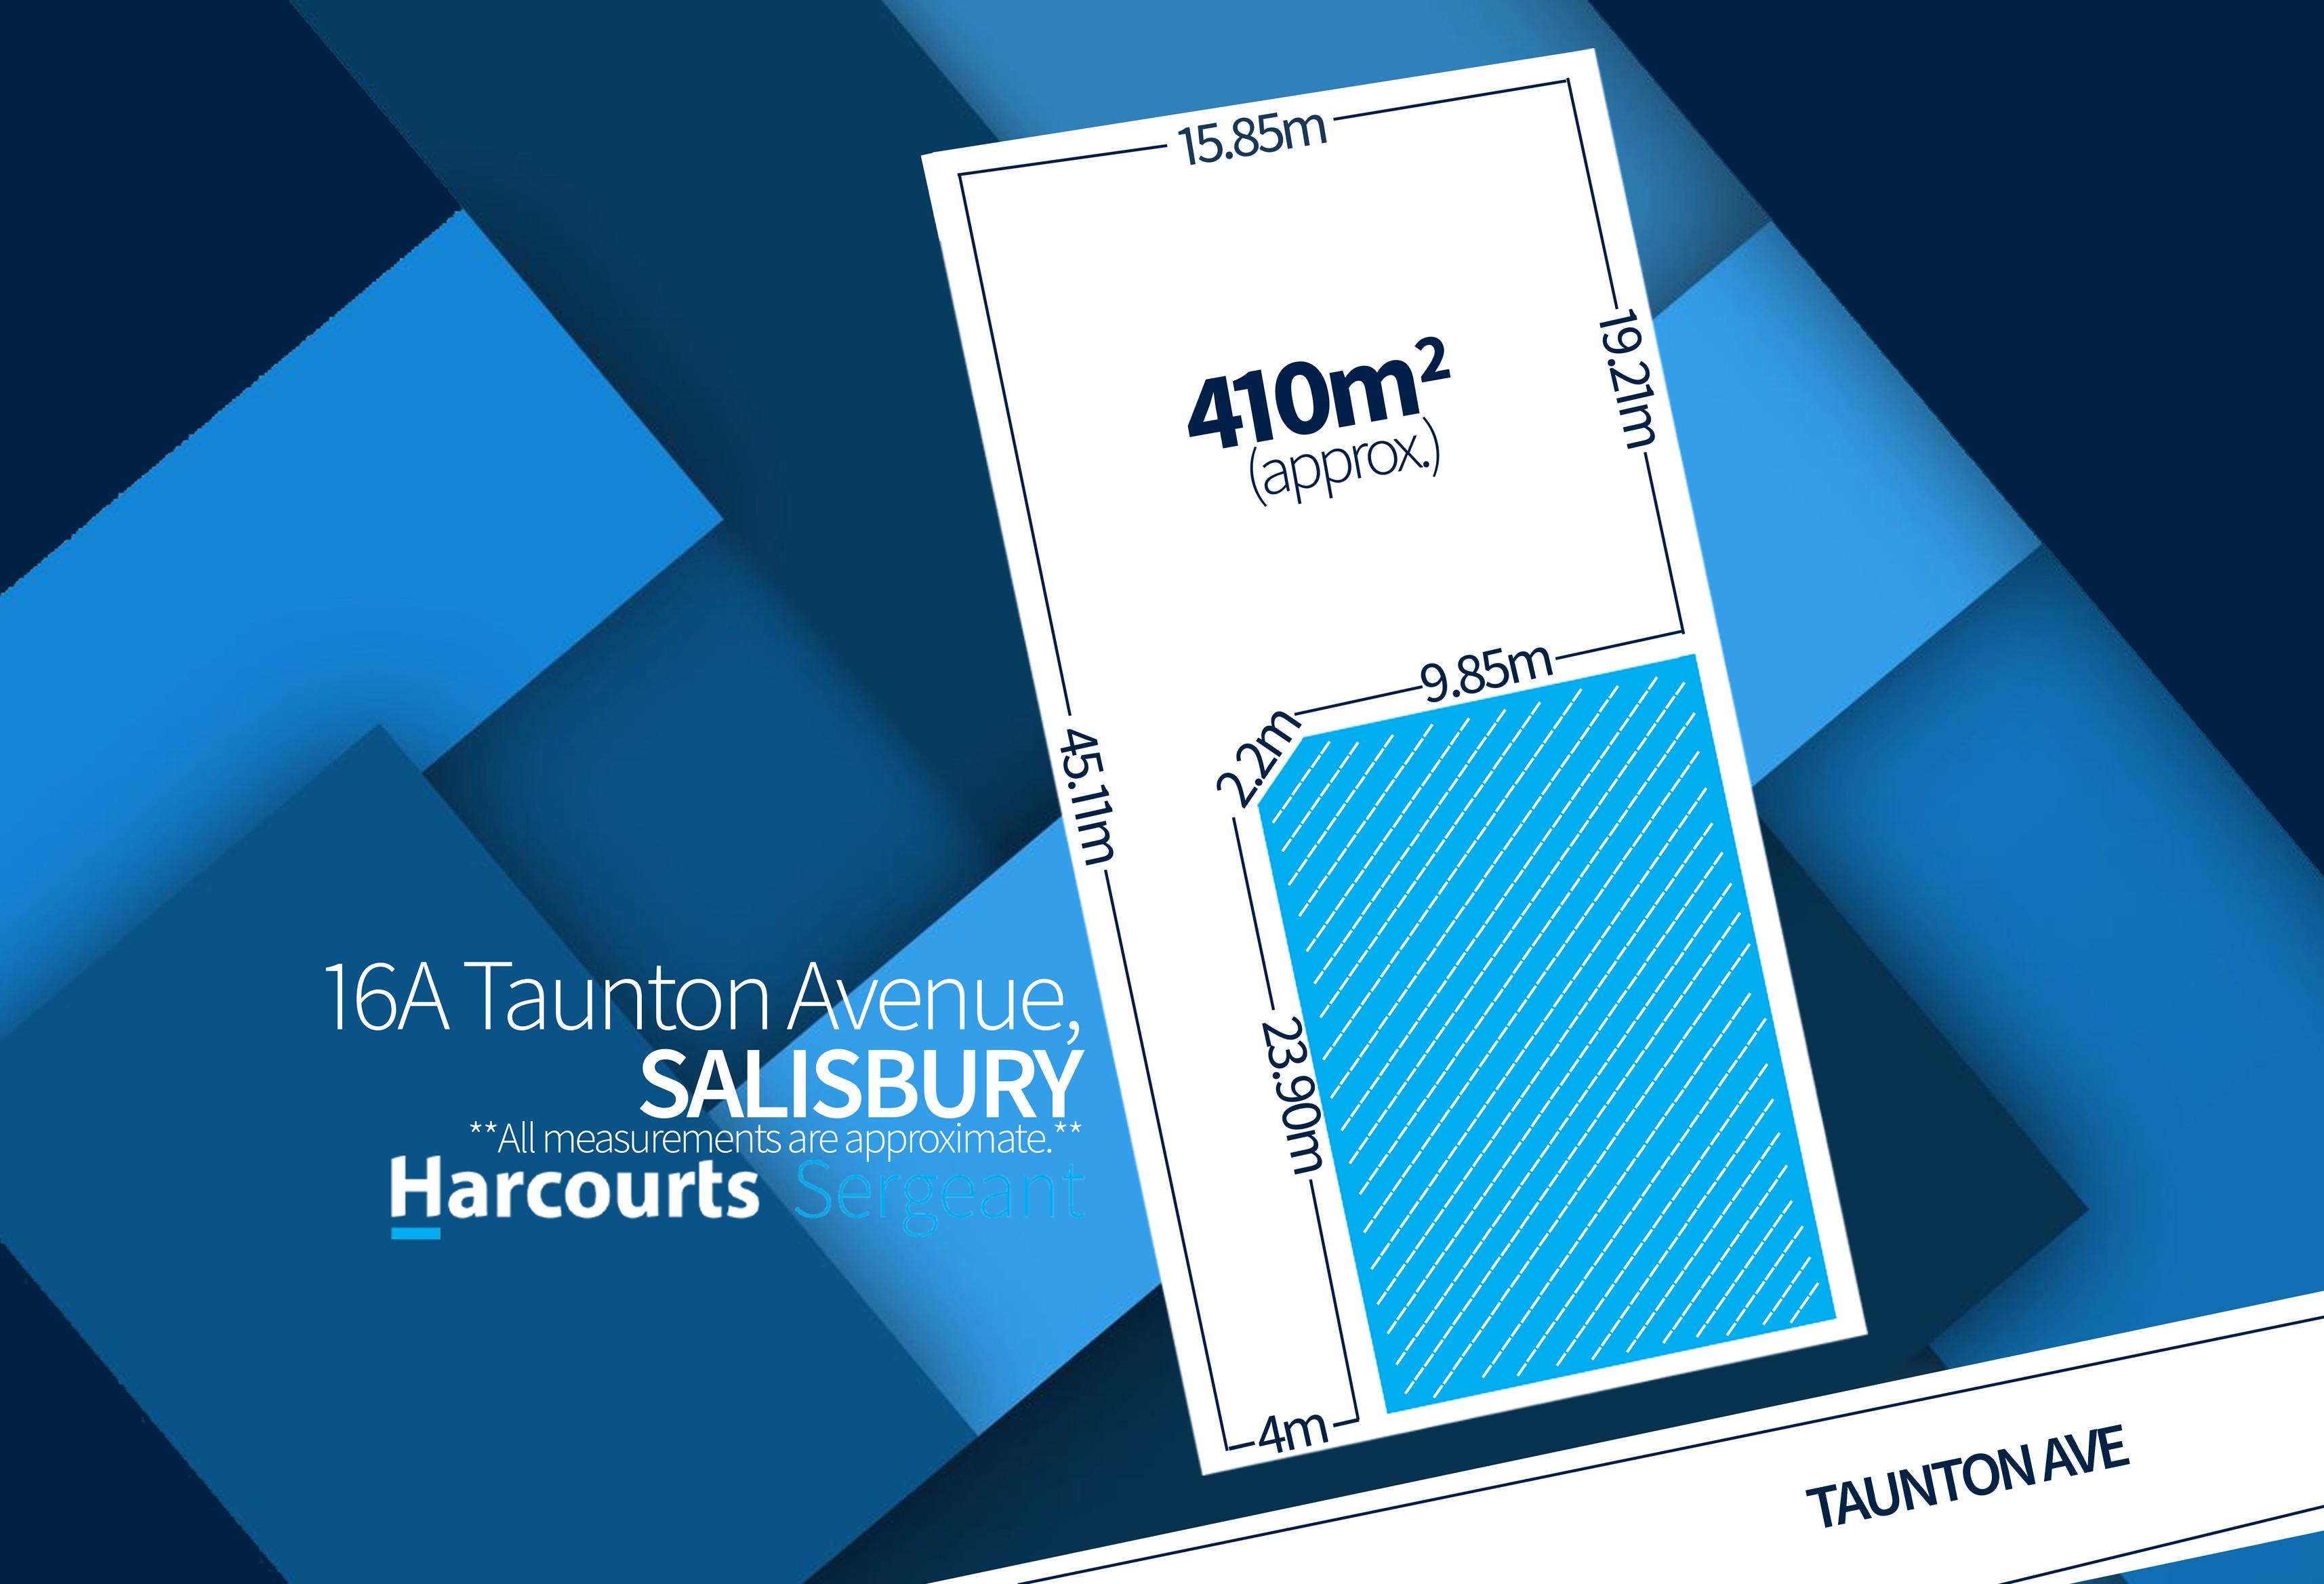 16A Taunton Avenue, Salisbury (Site Plan